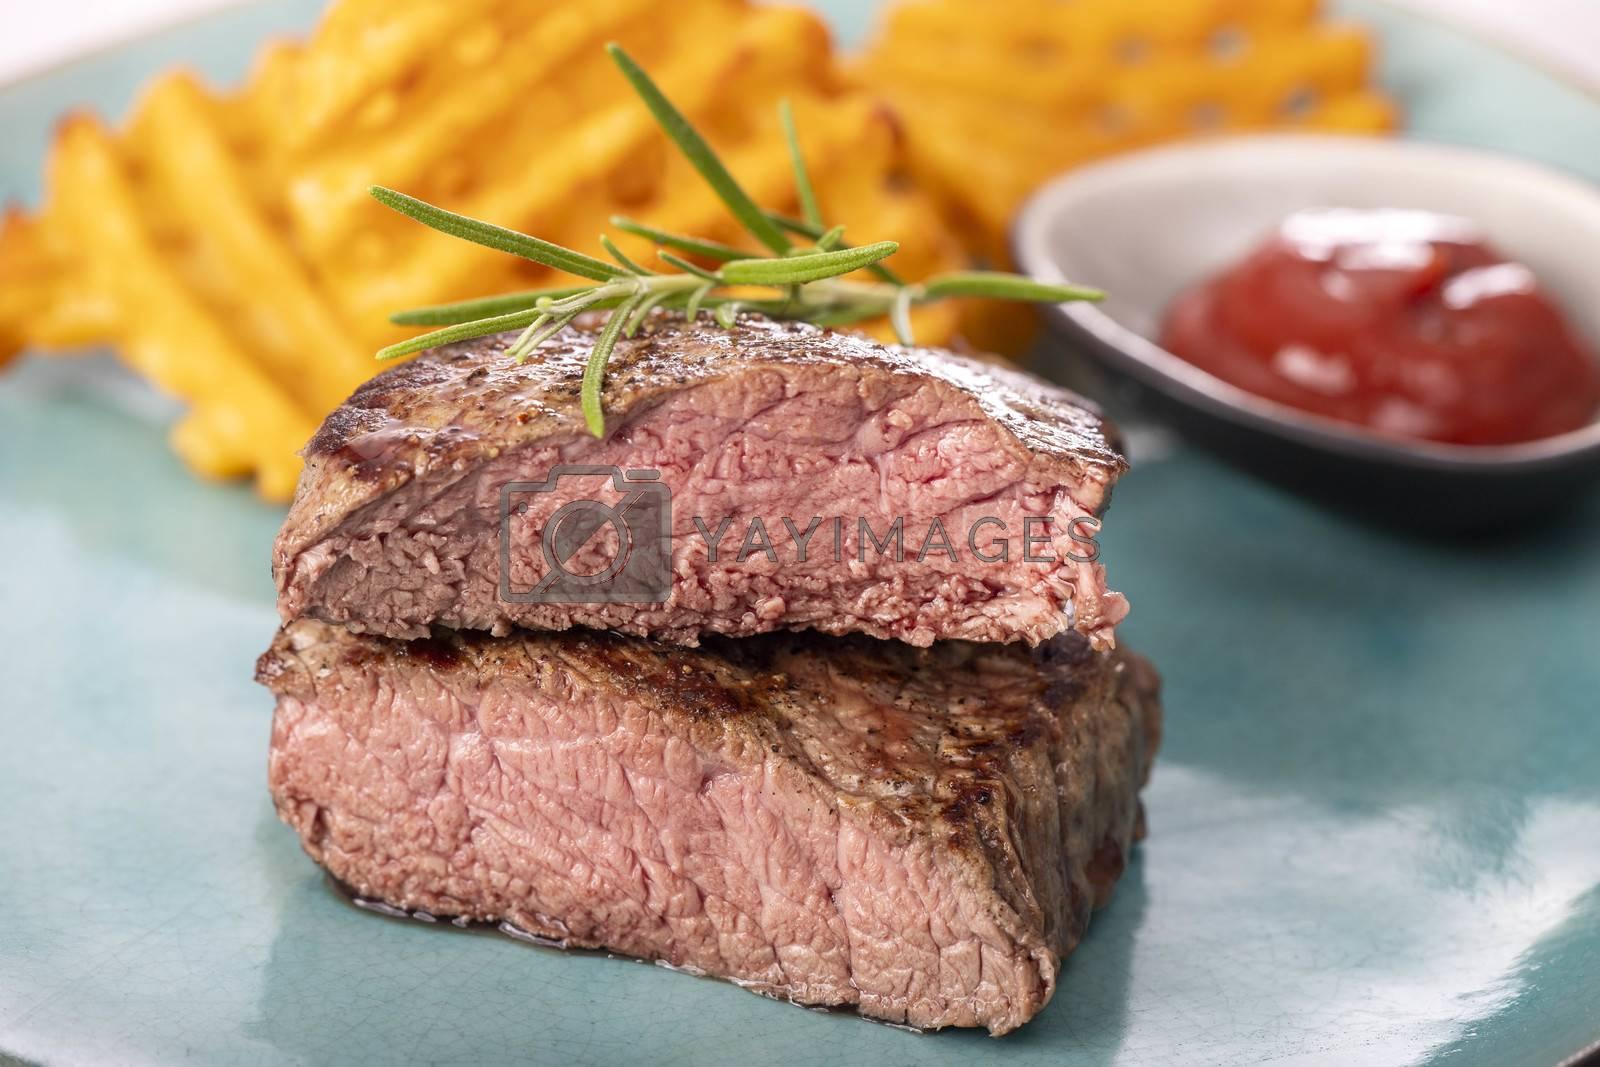 grilled steak with fresh potato lattices